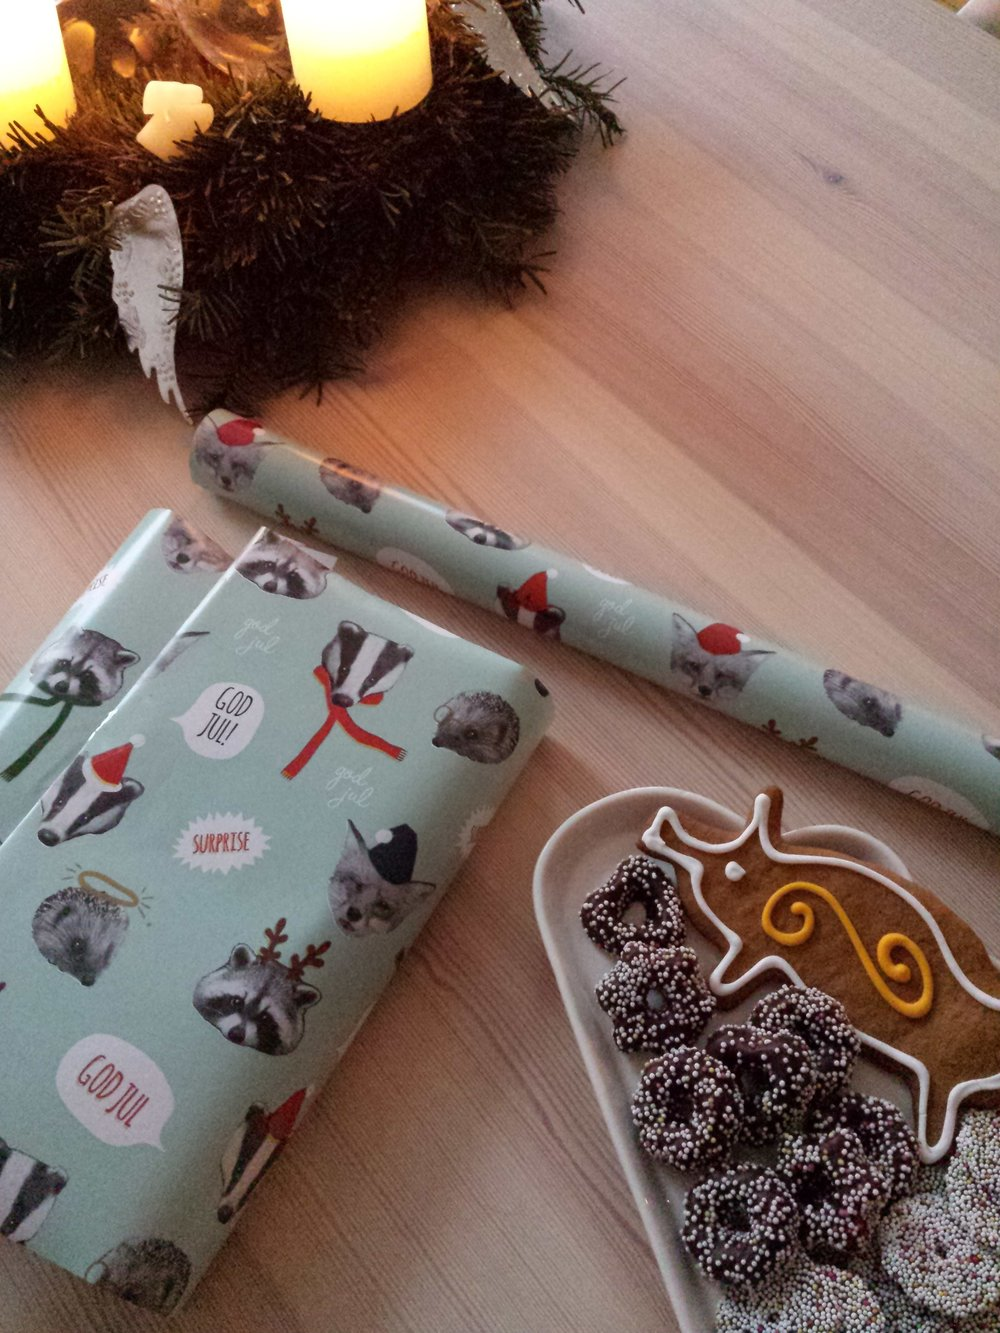 Weihnachtsgeschenke-Ideen. Jahhahaha! — JudithYoudidit